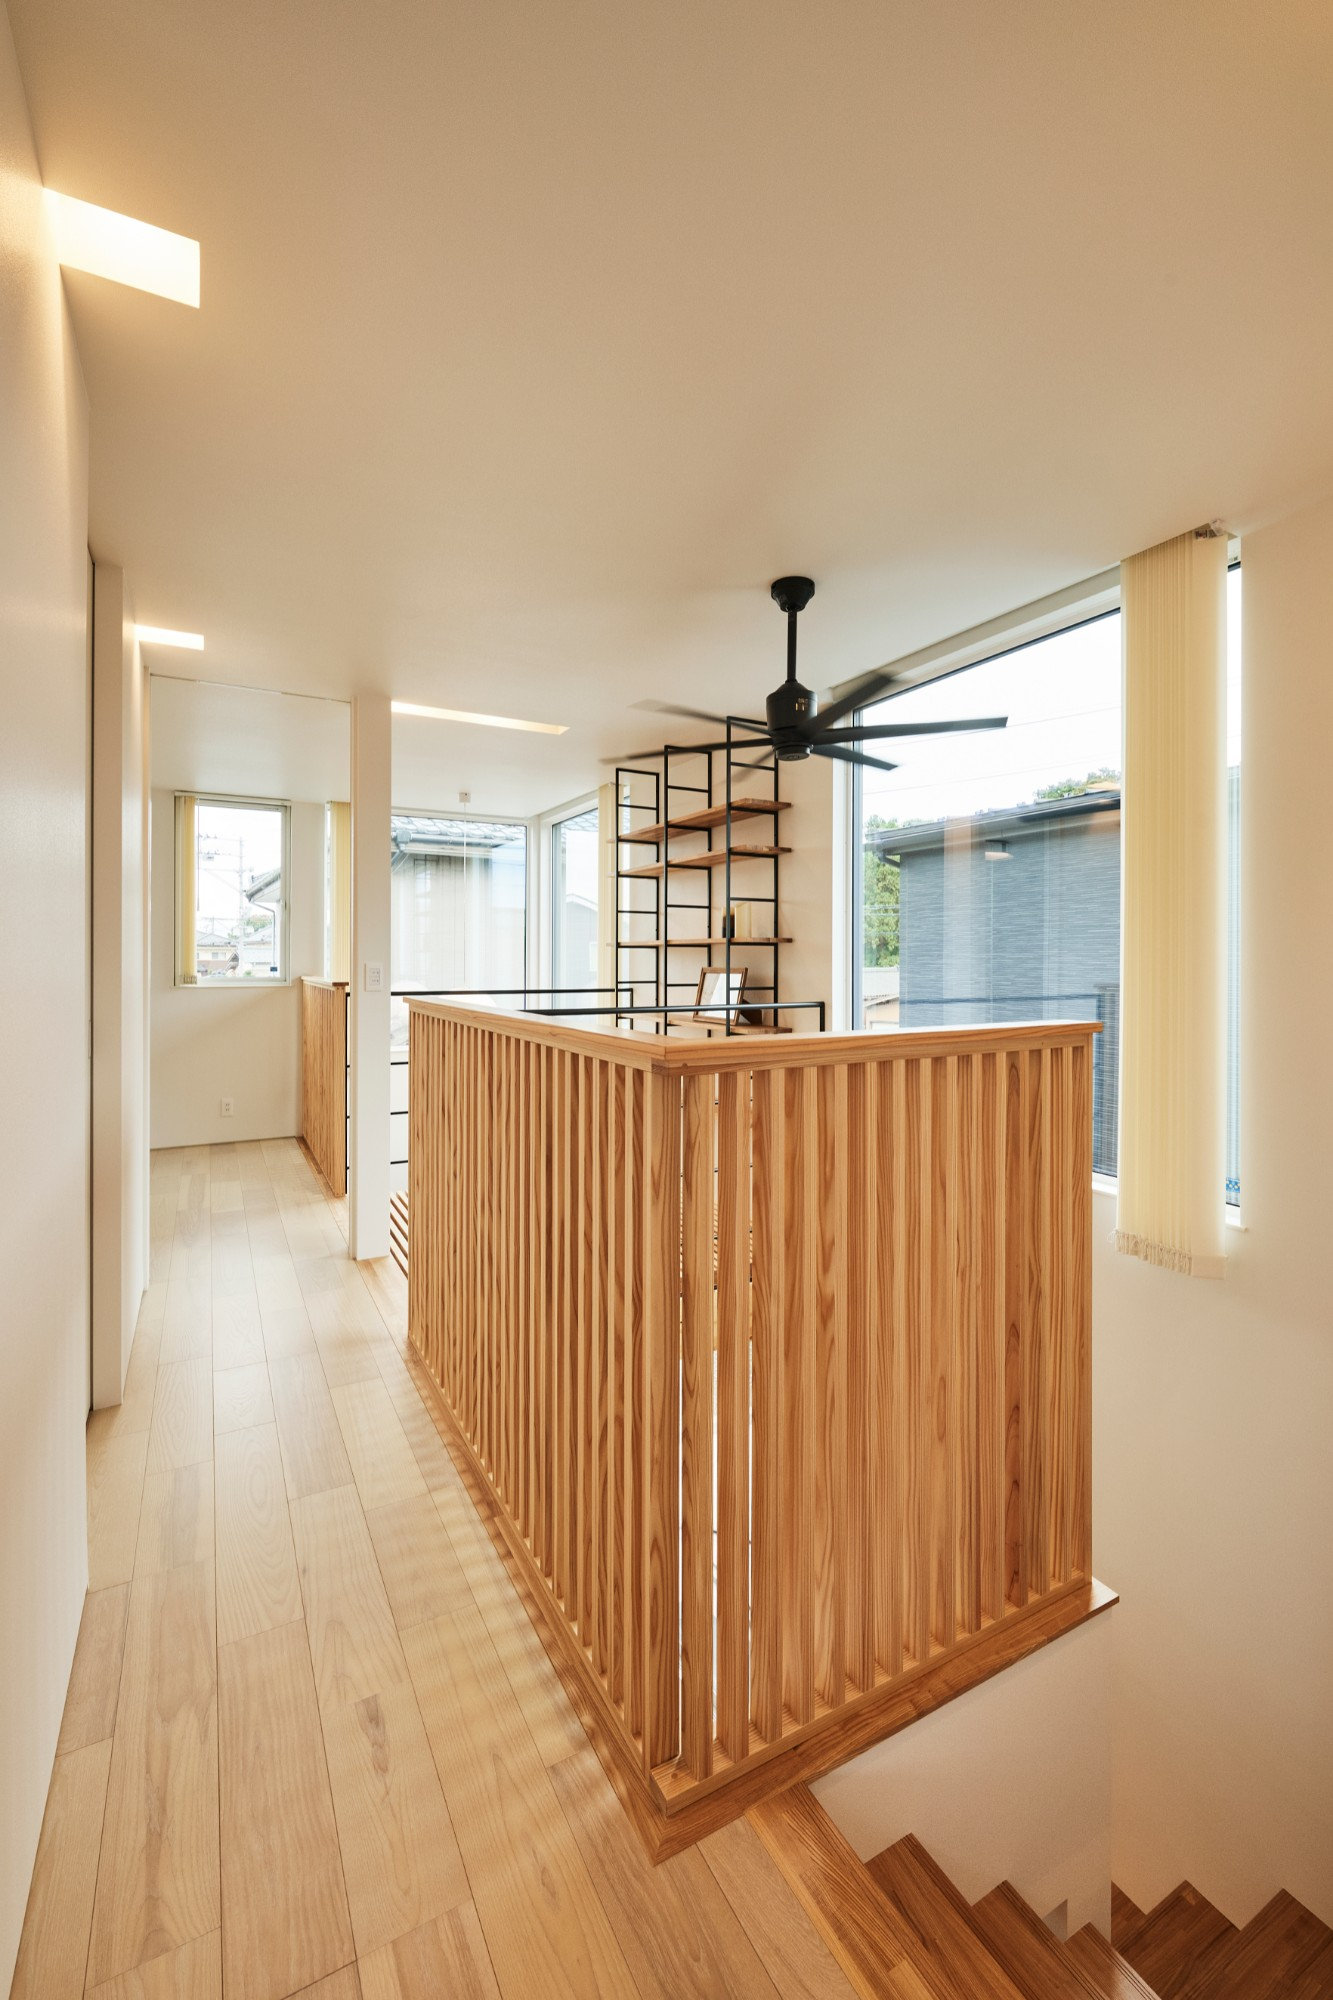 DETAIL HOME(ディテールホーム)「コンパクトにデザインする家」のシンプル・ナチュラルな廊下の実例写真